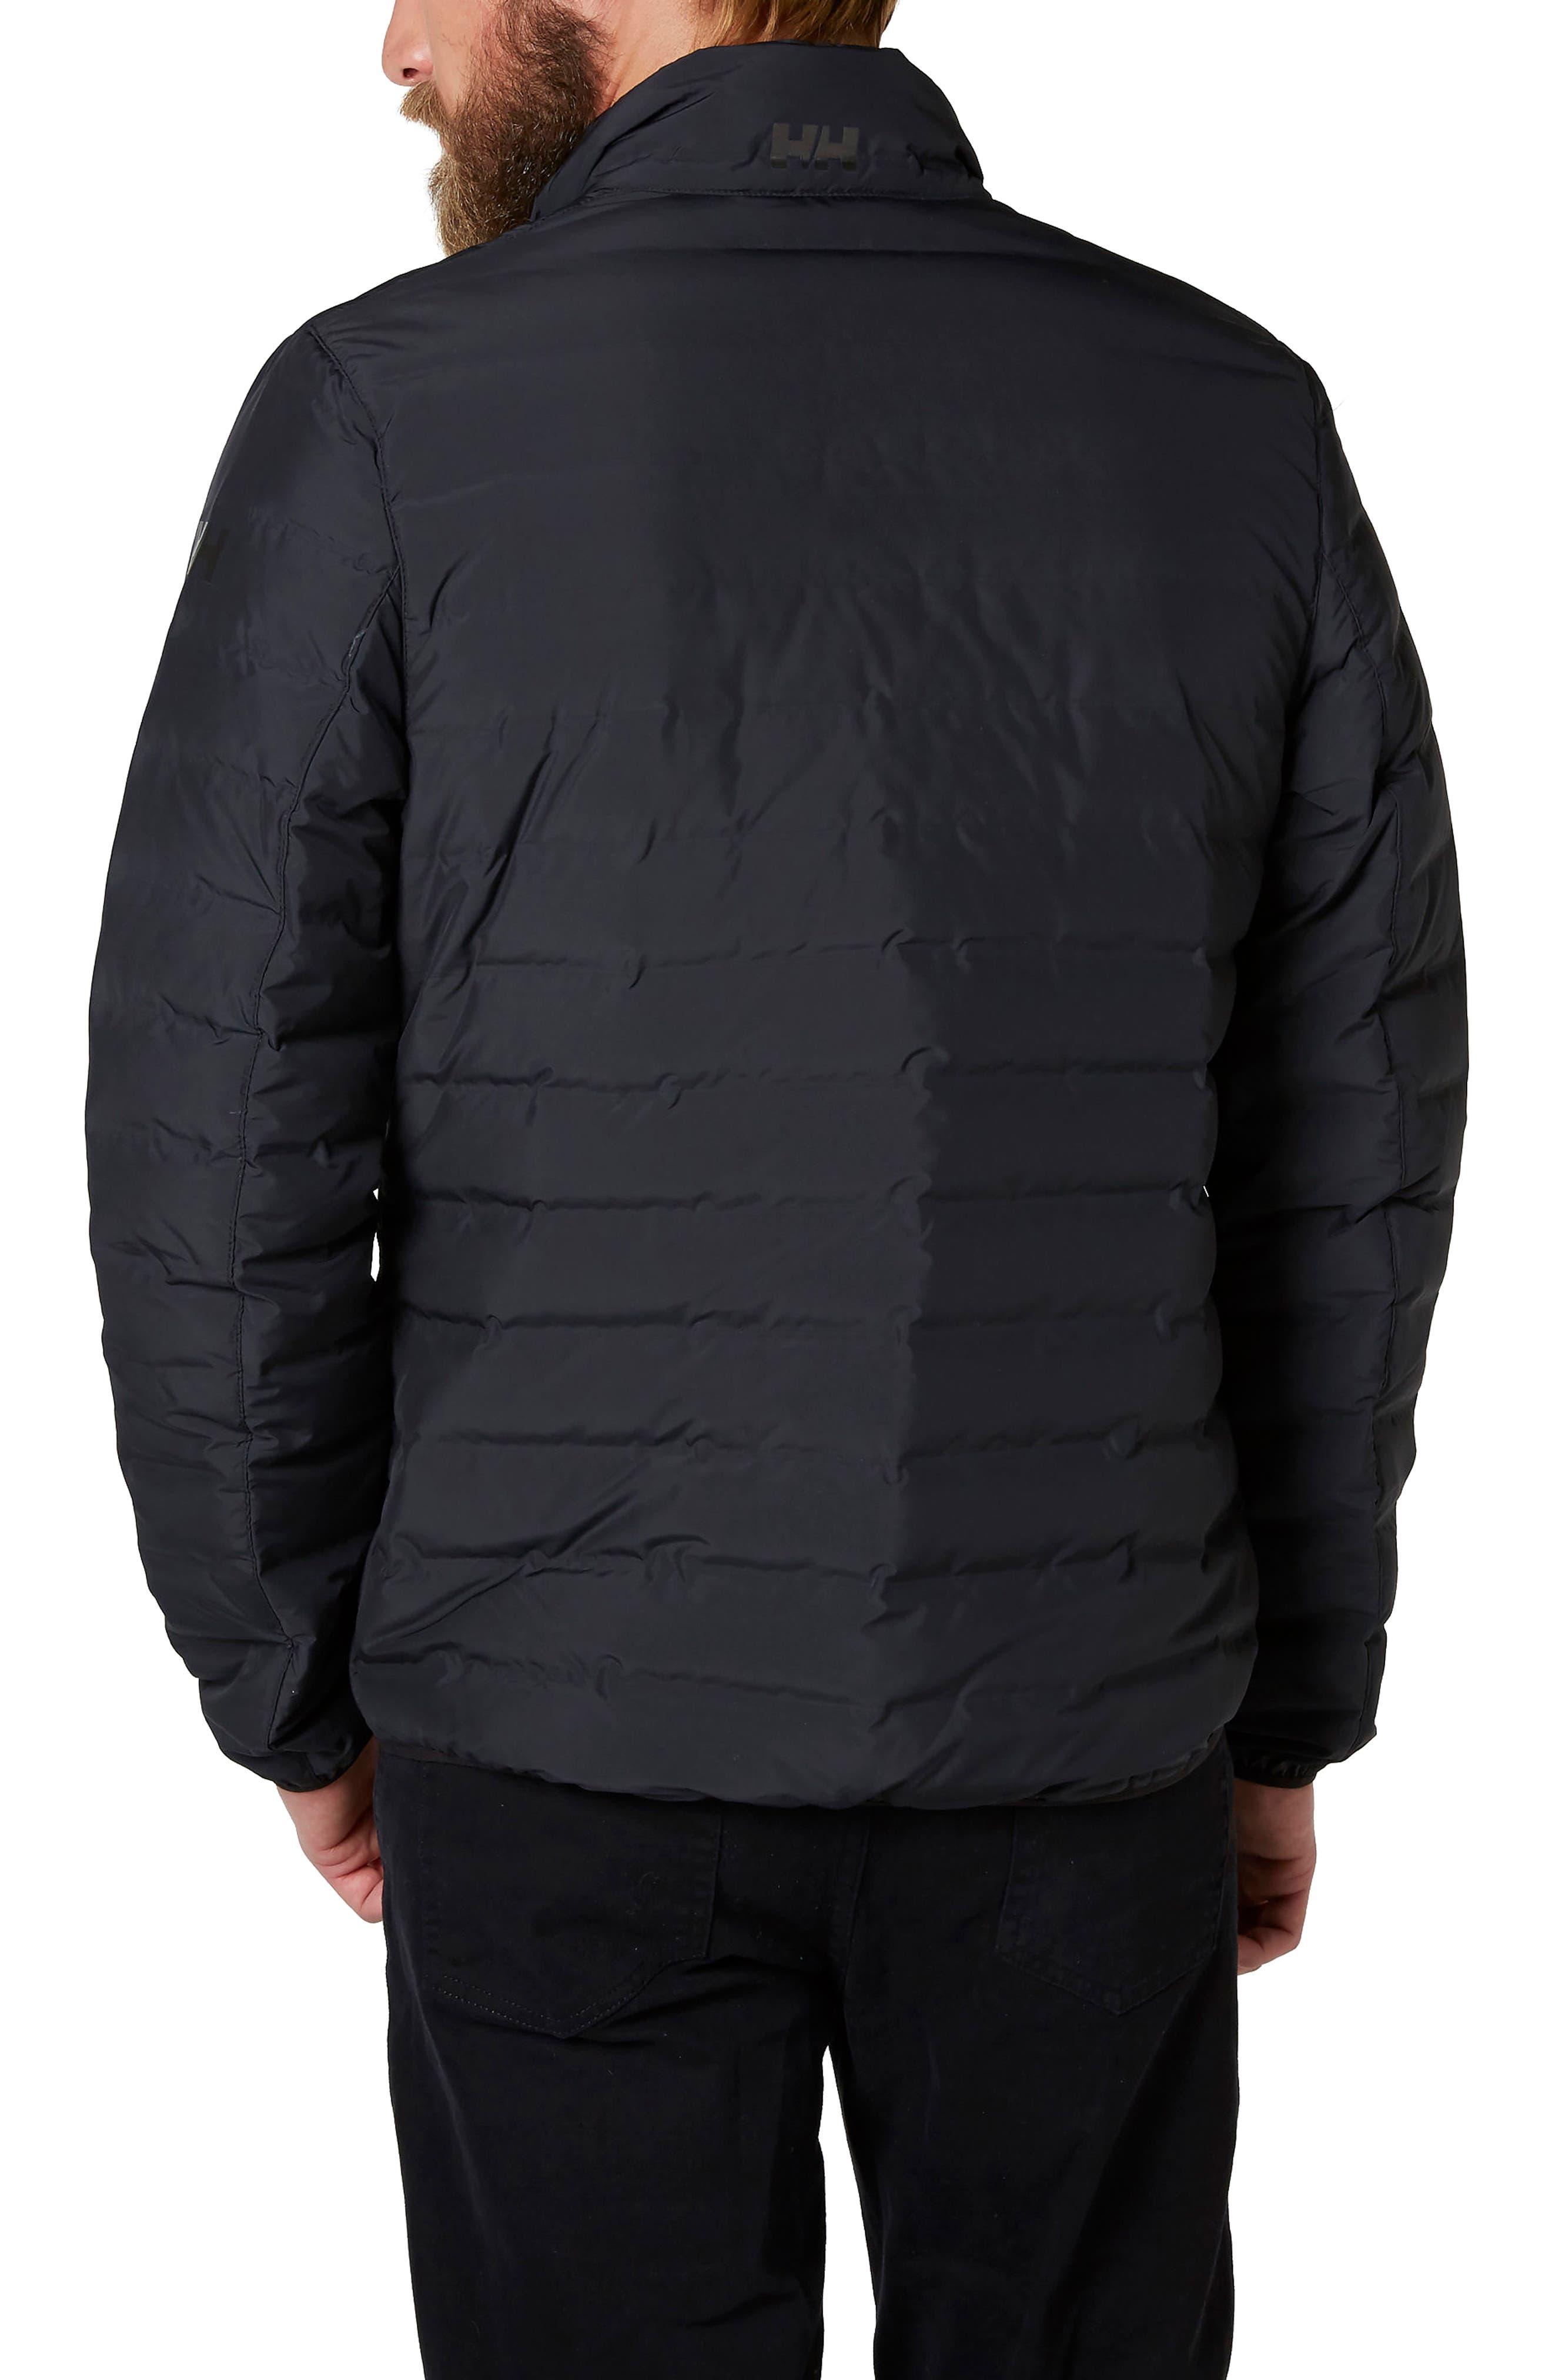 Urban Liner Jacket,                             Alternate thumbnail 2, color,                             001